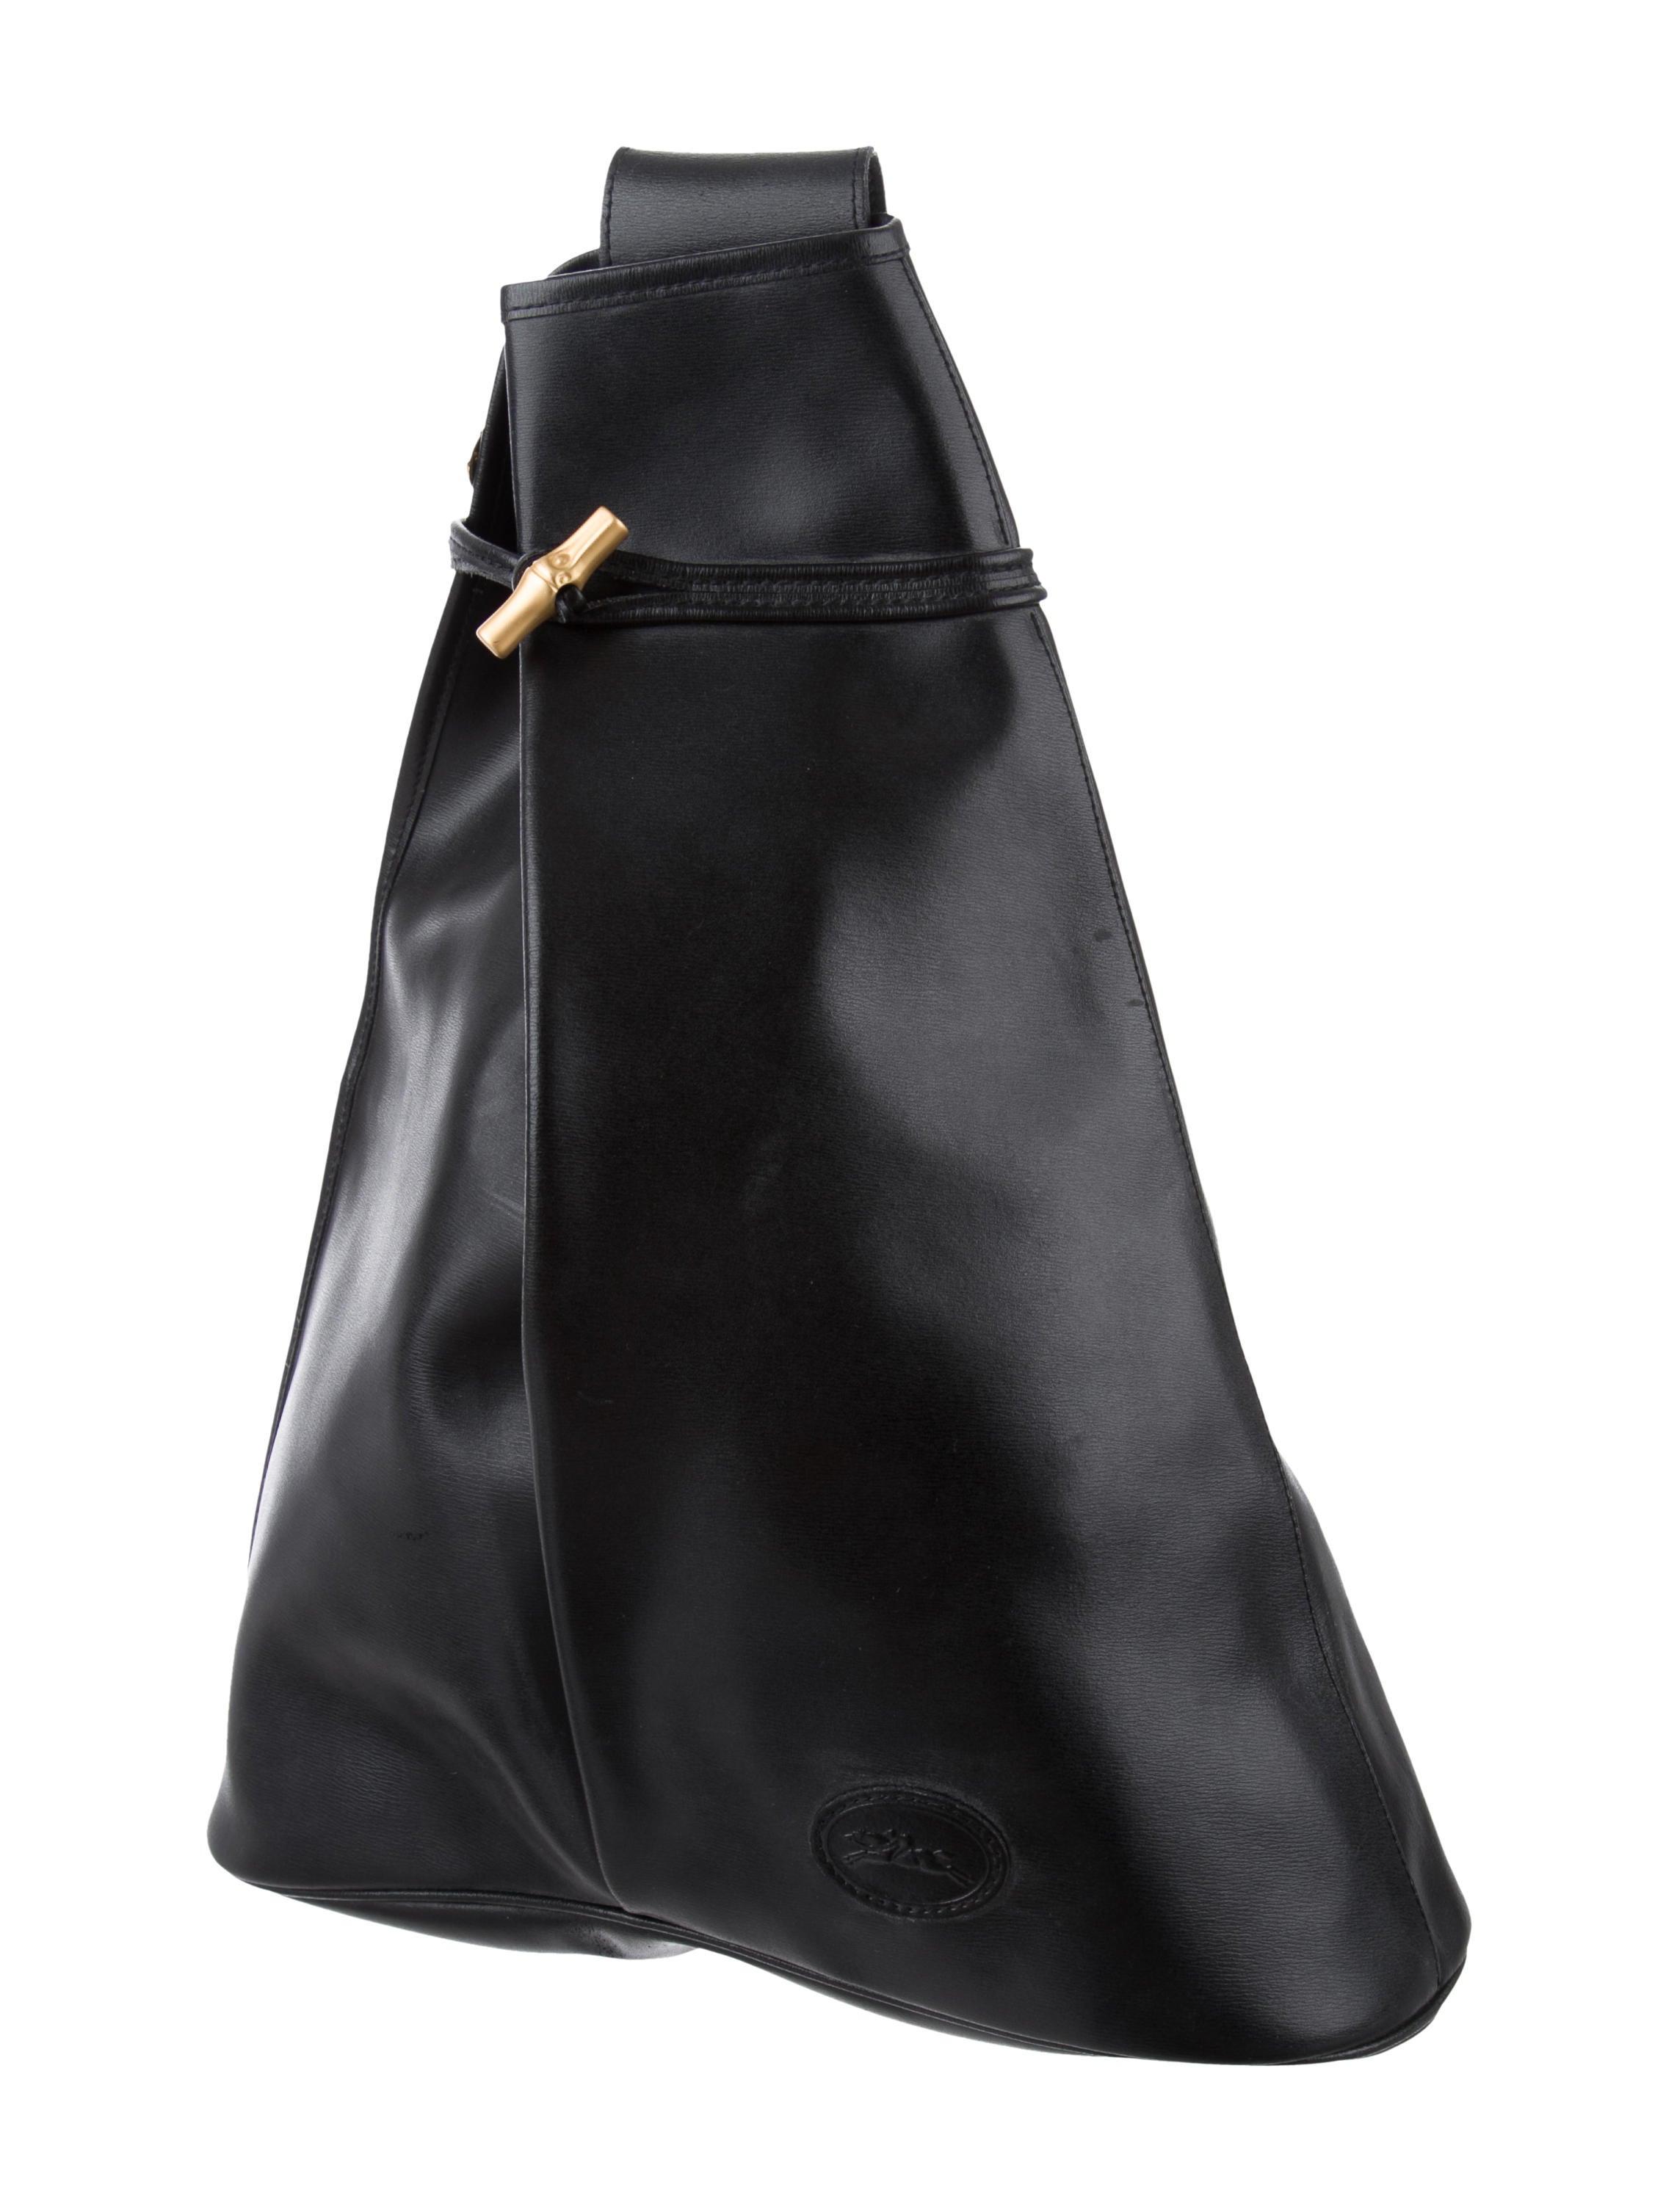 Longchamp Roseau Sling Bag - Handbags - WL822625   The RealReal